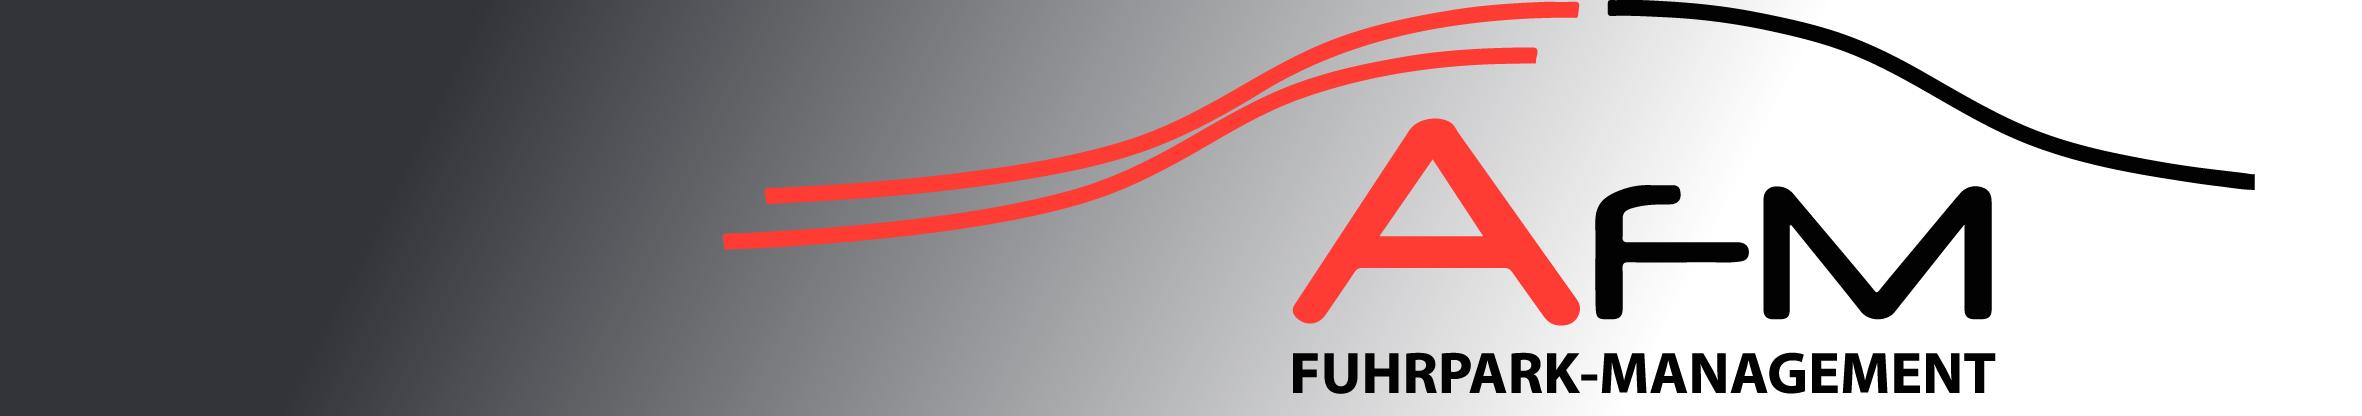 AFM Service